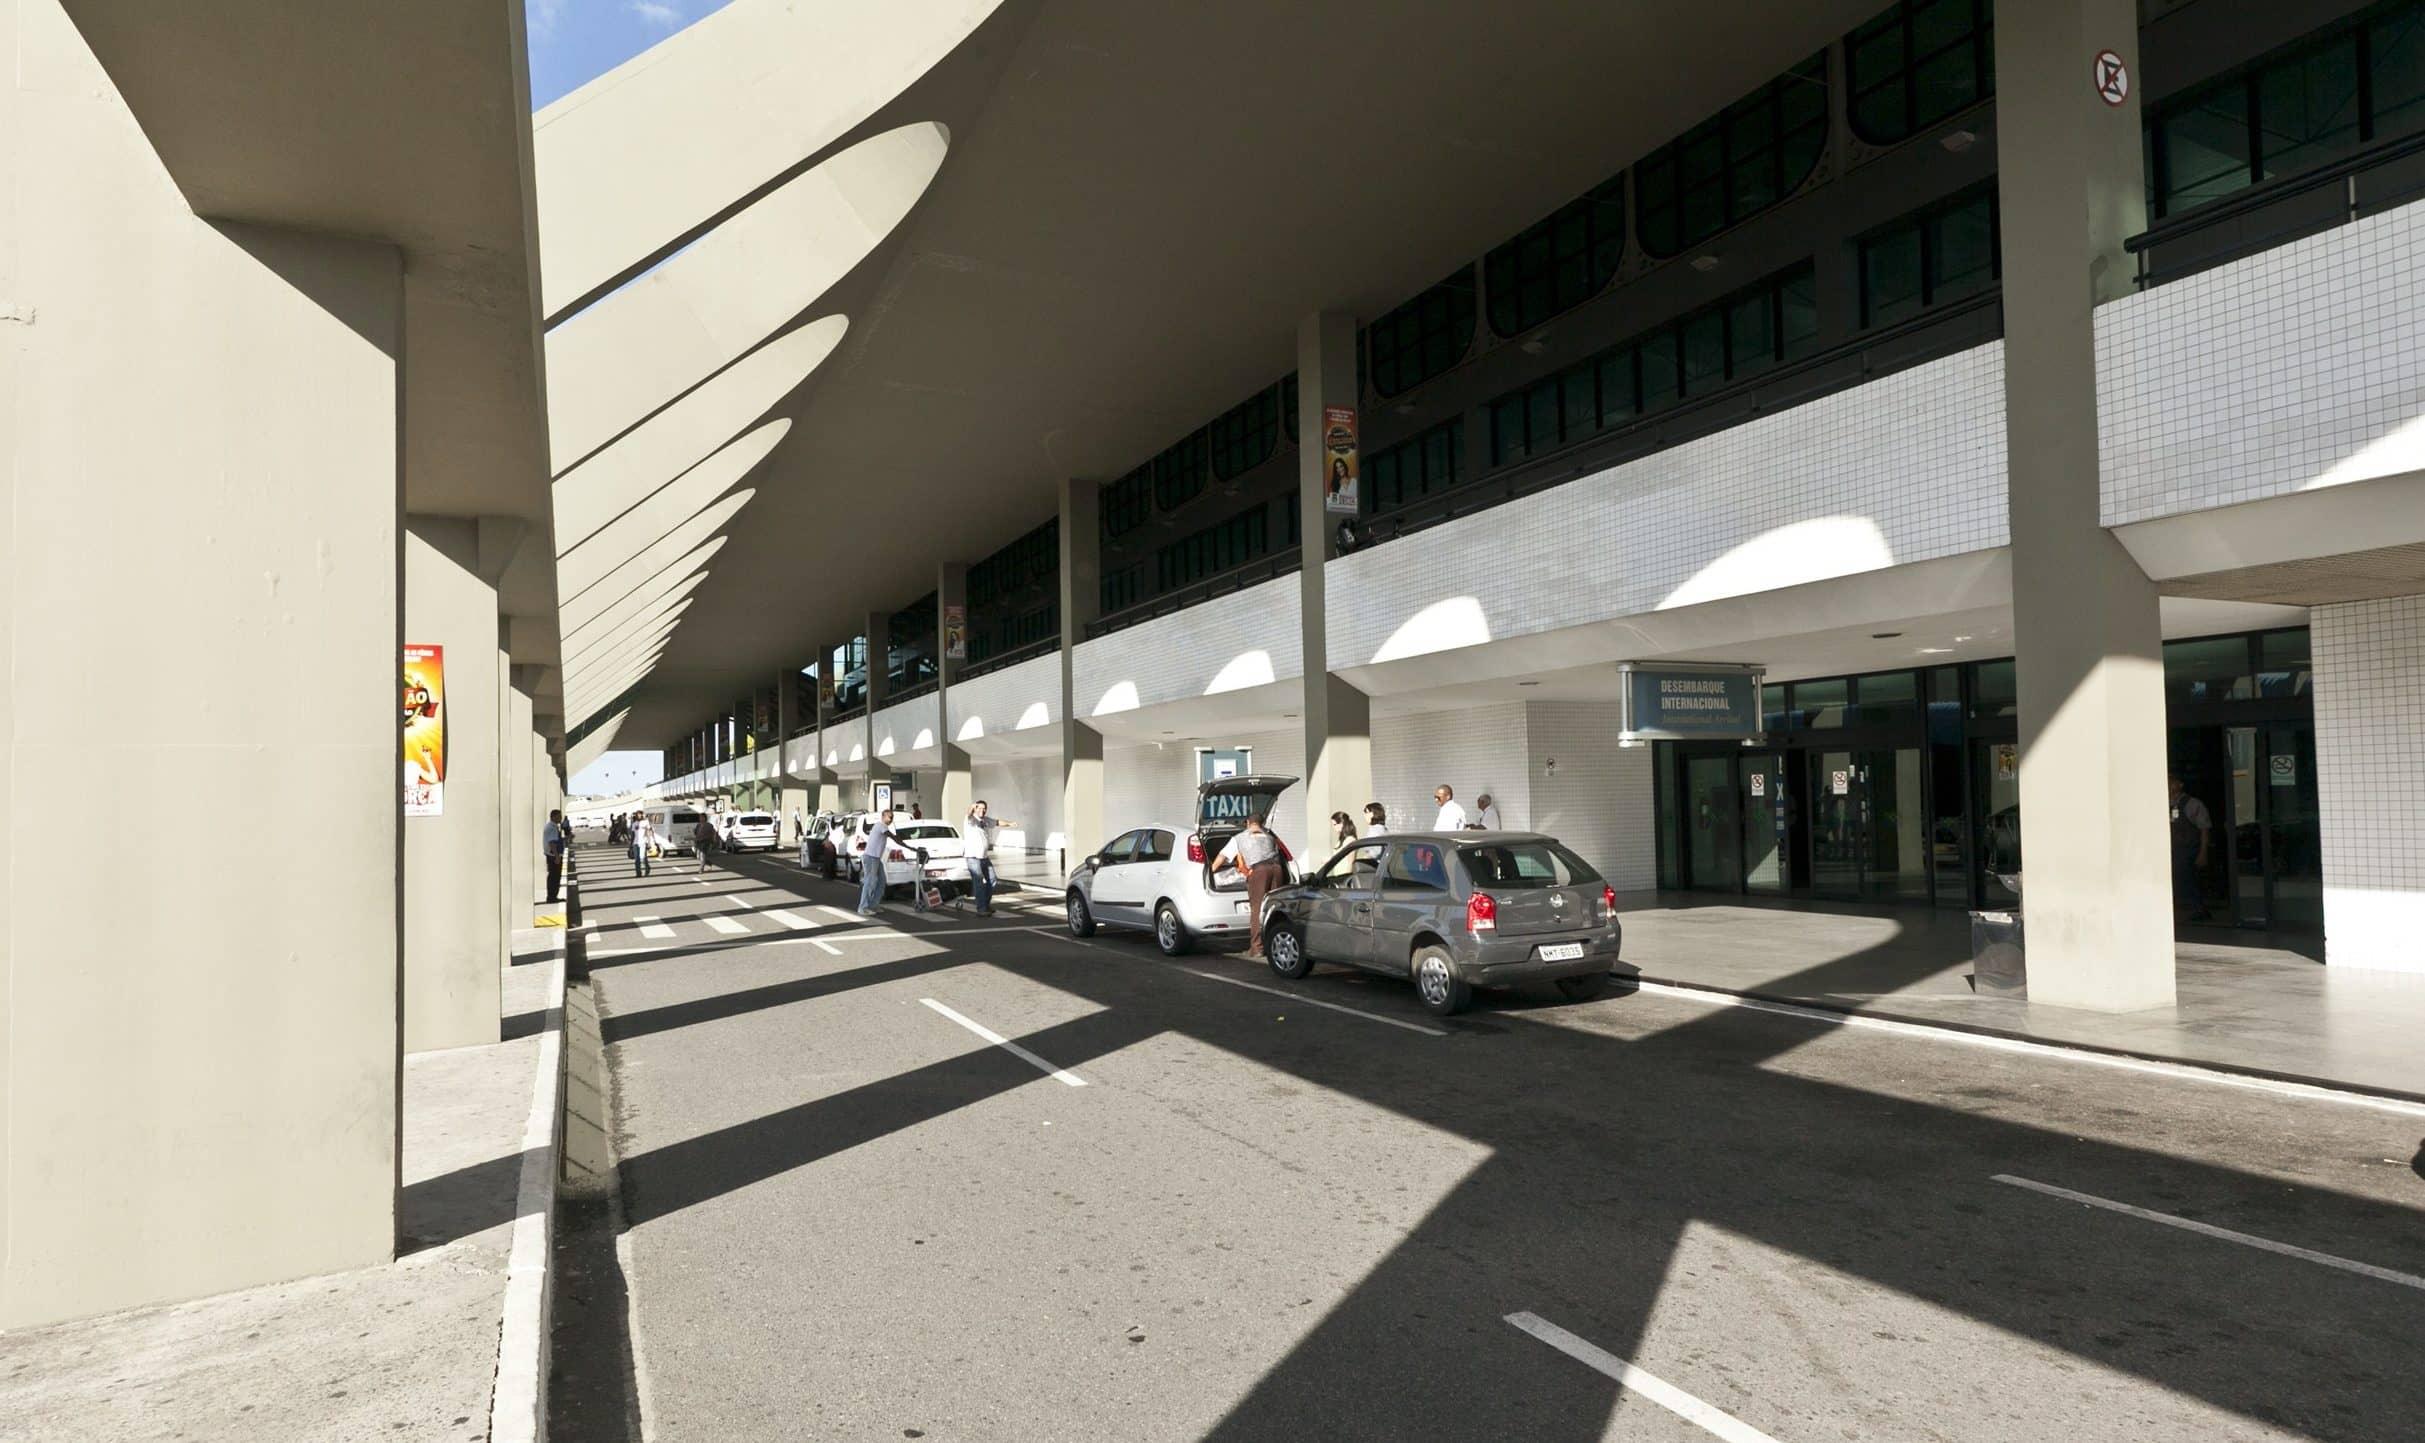 Como ir do aeroporto de Salvador até o centro turístico: Táxis na área de desembarque do aeroporto